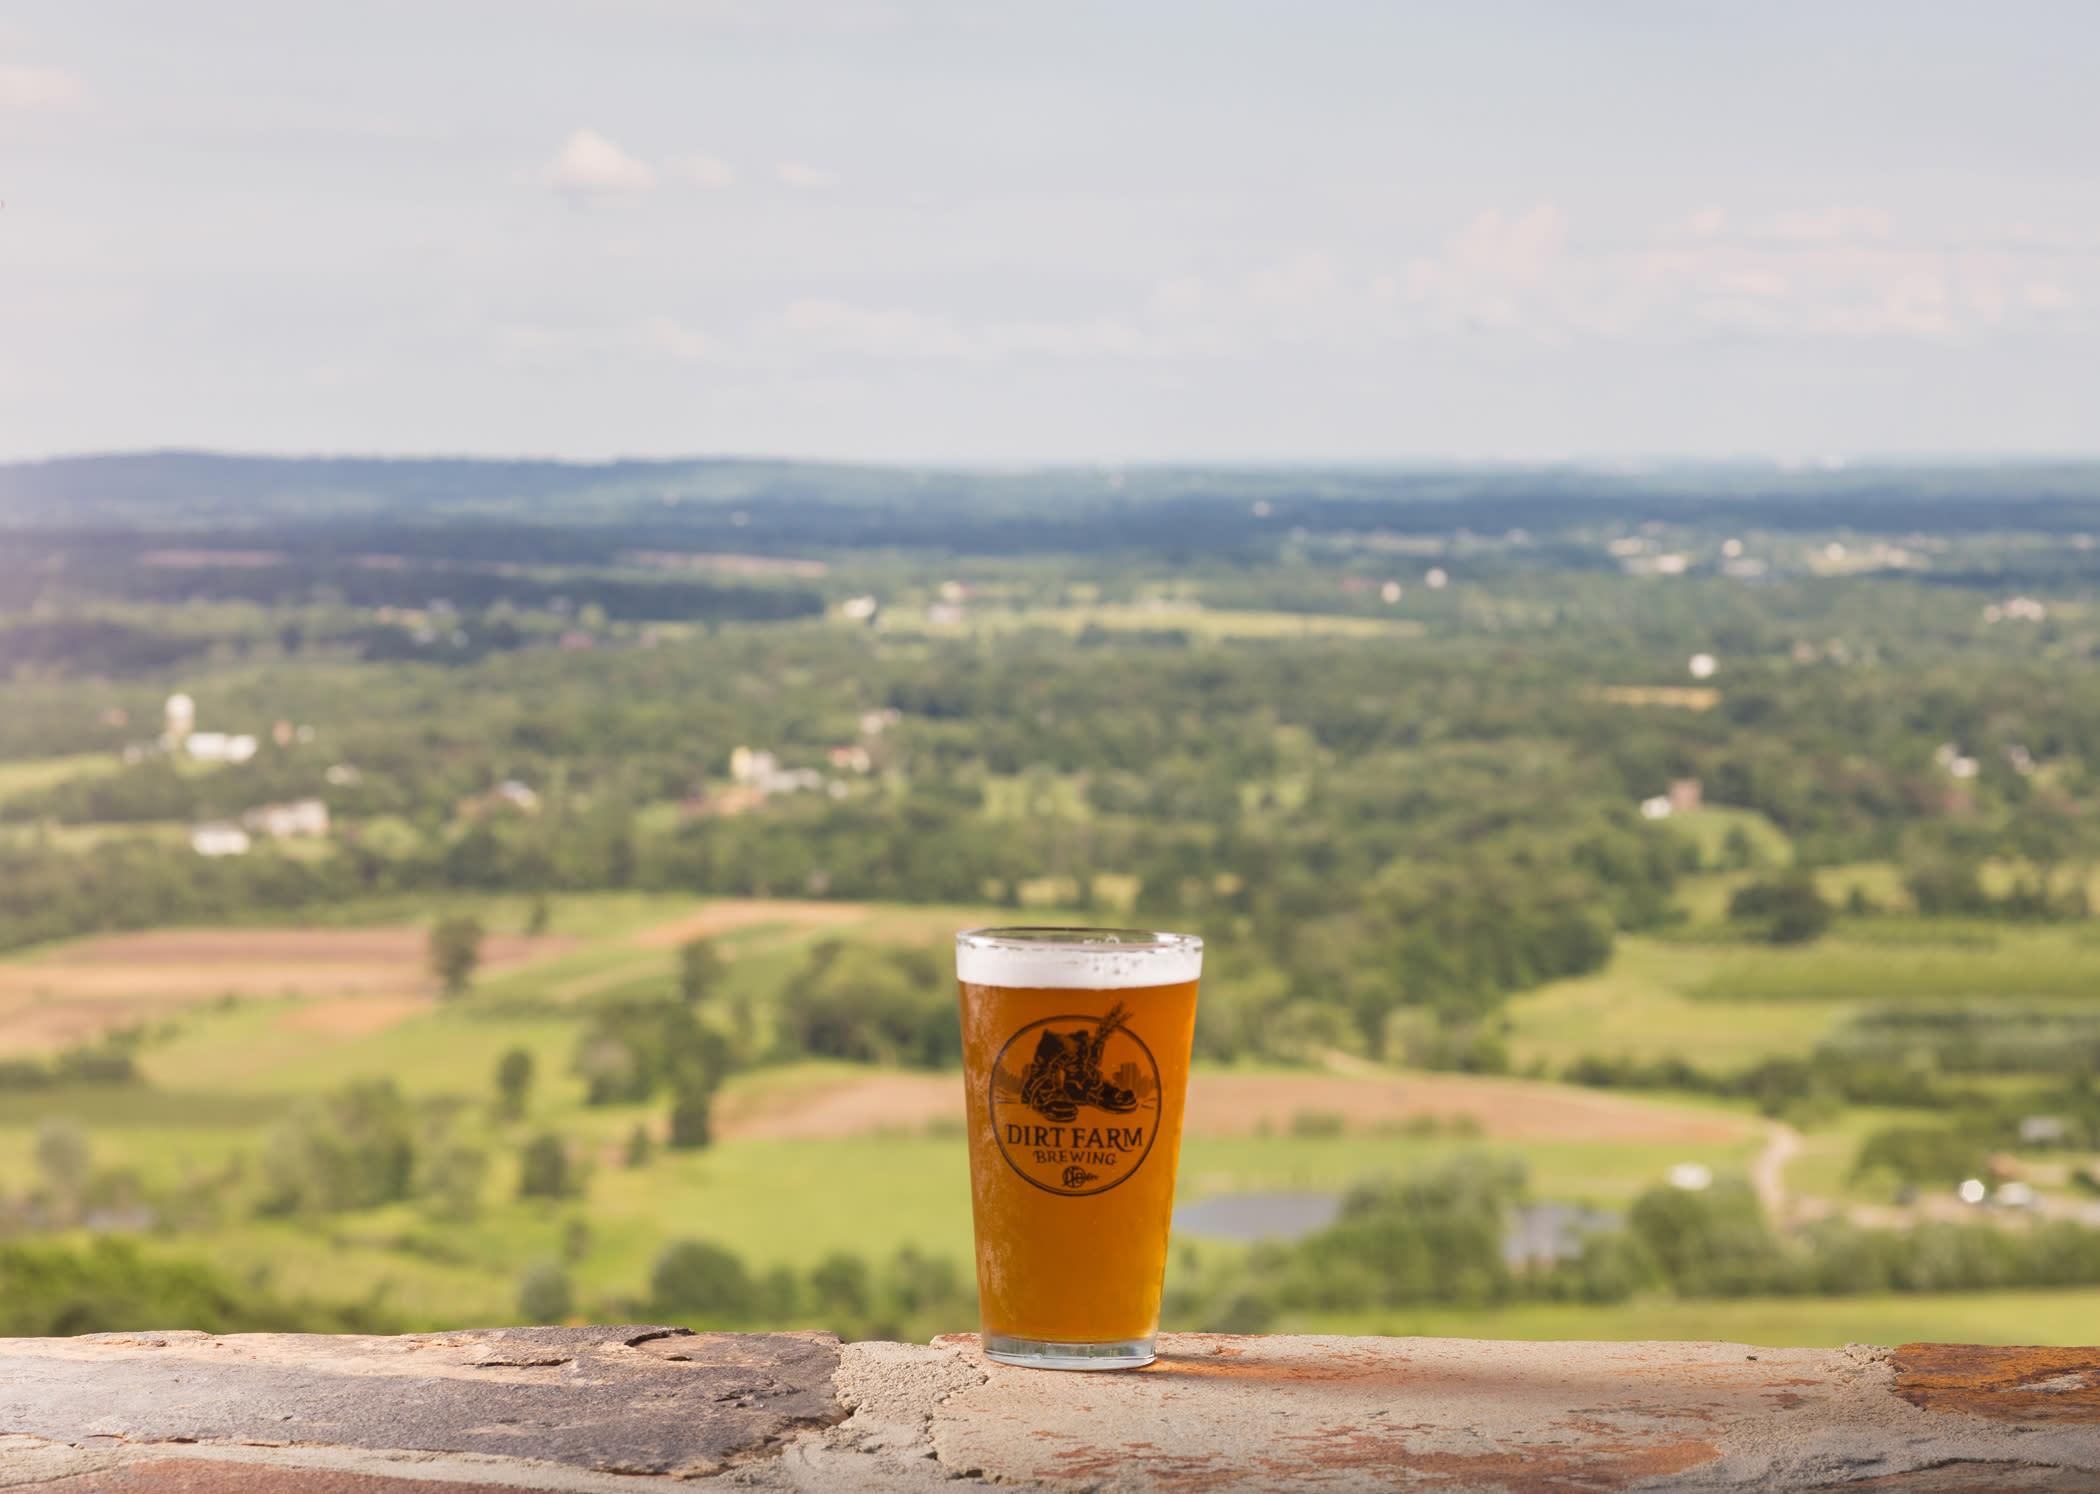 Dirt Farm Beer Landscape